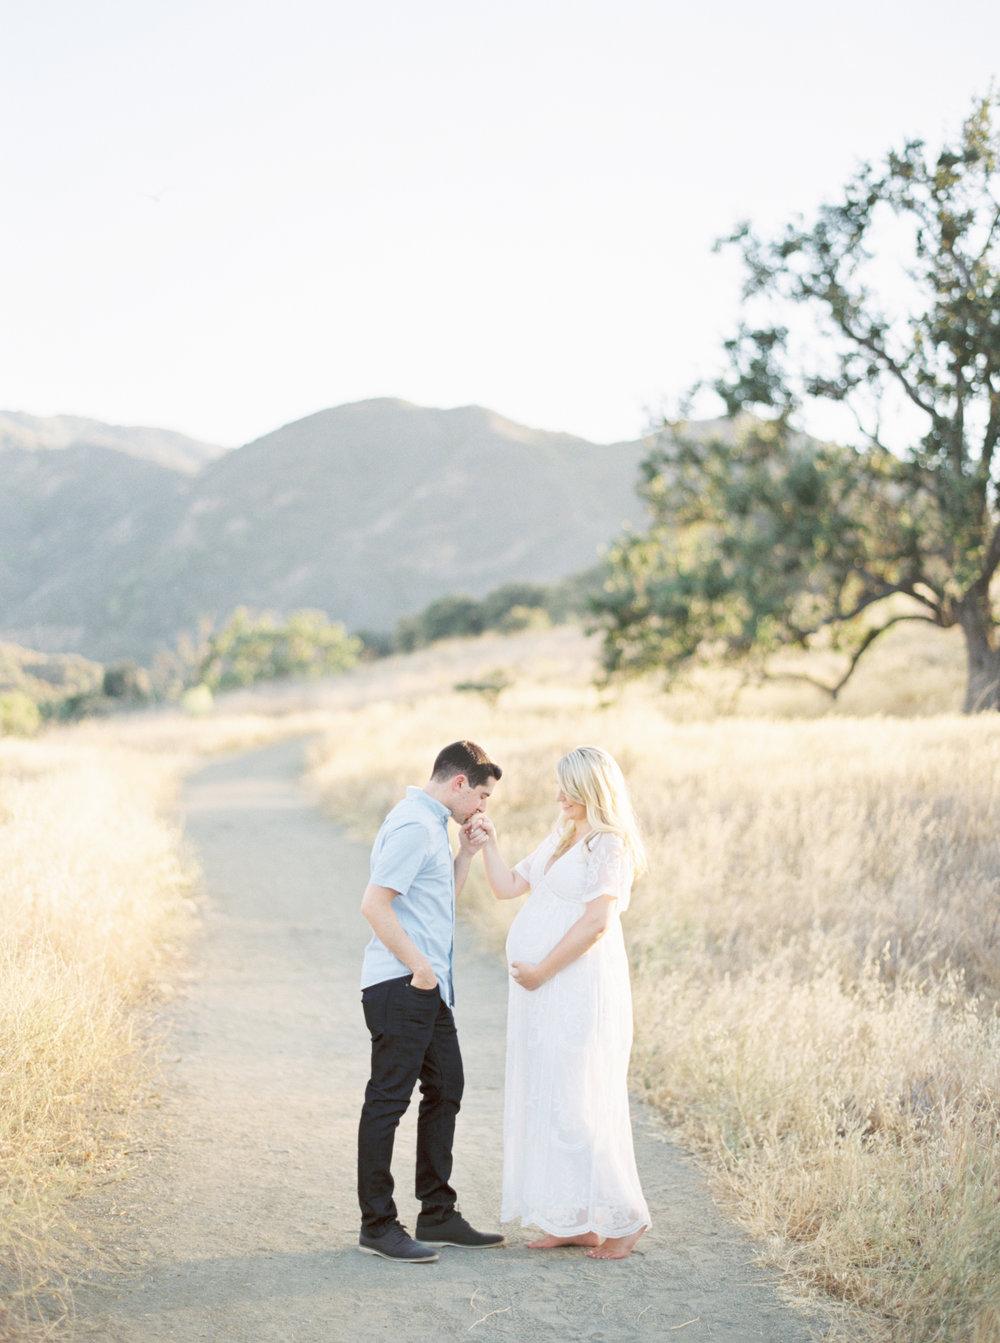 Rachel Owens Photography - Malibu Creek - Film Photography-20.jpg